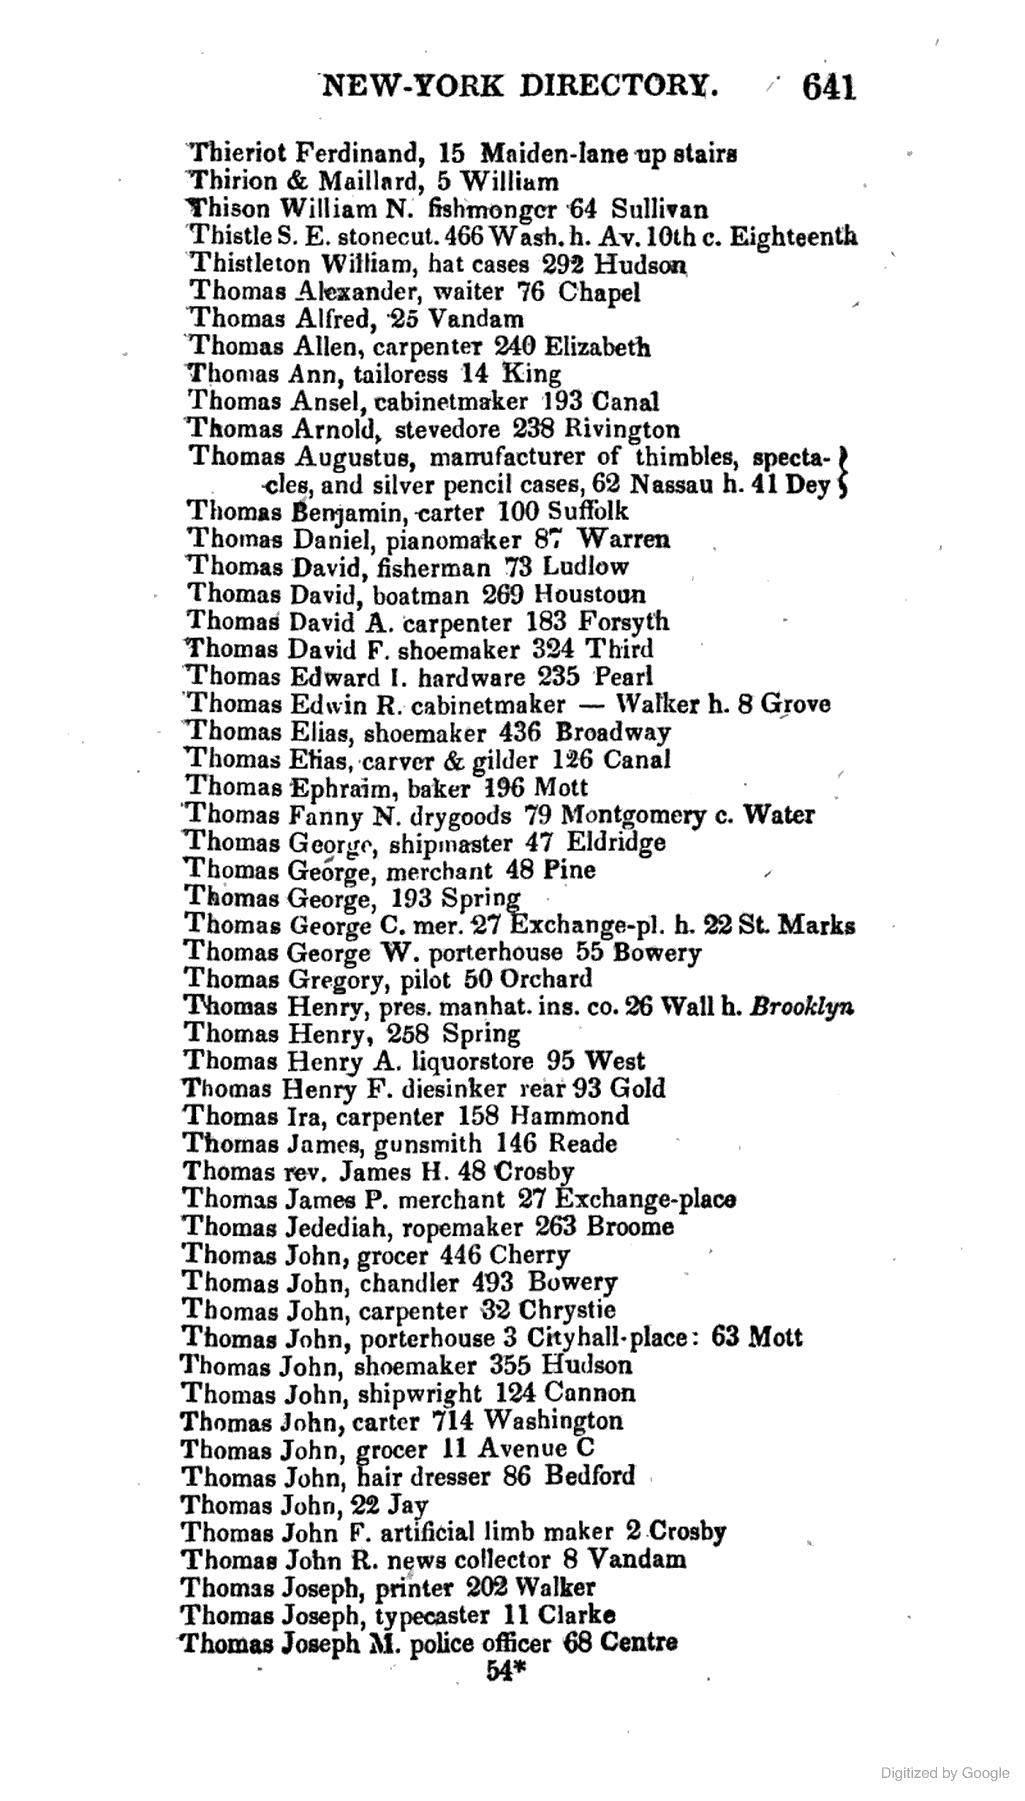 Thomas George W., PORTERHOUSE, 55 Bowery. 1835 Longworth's